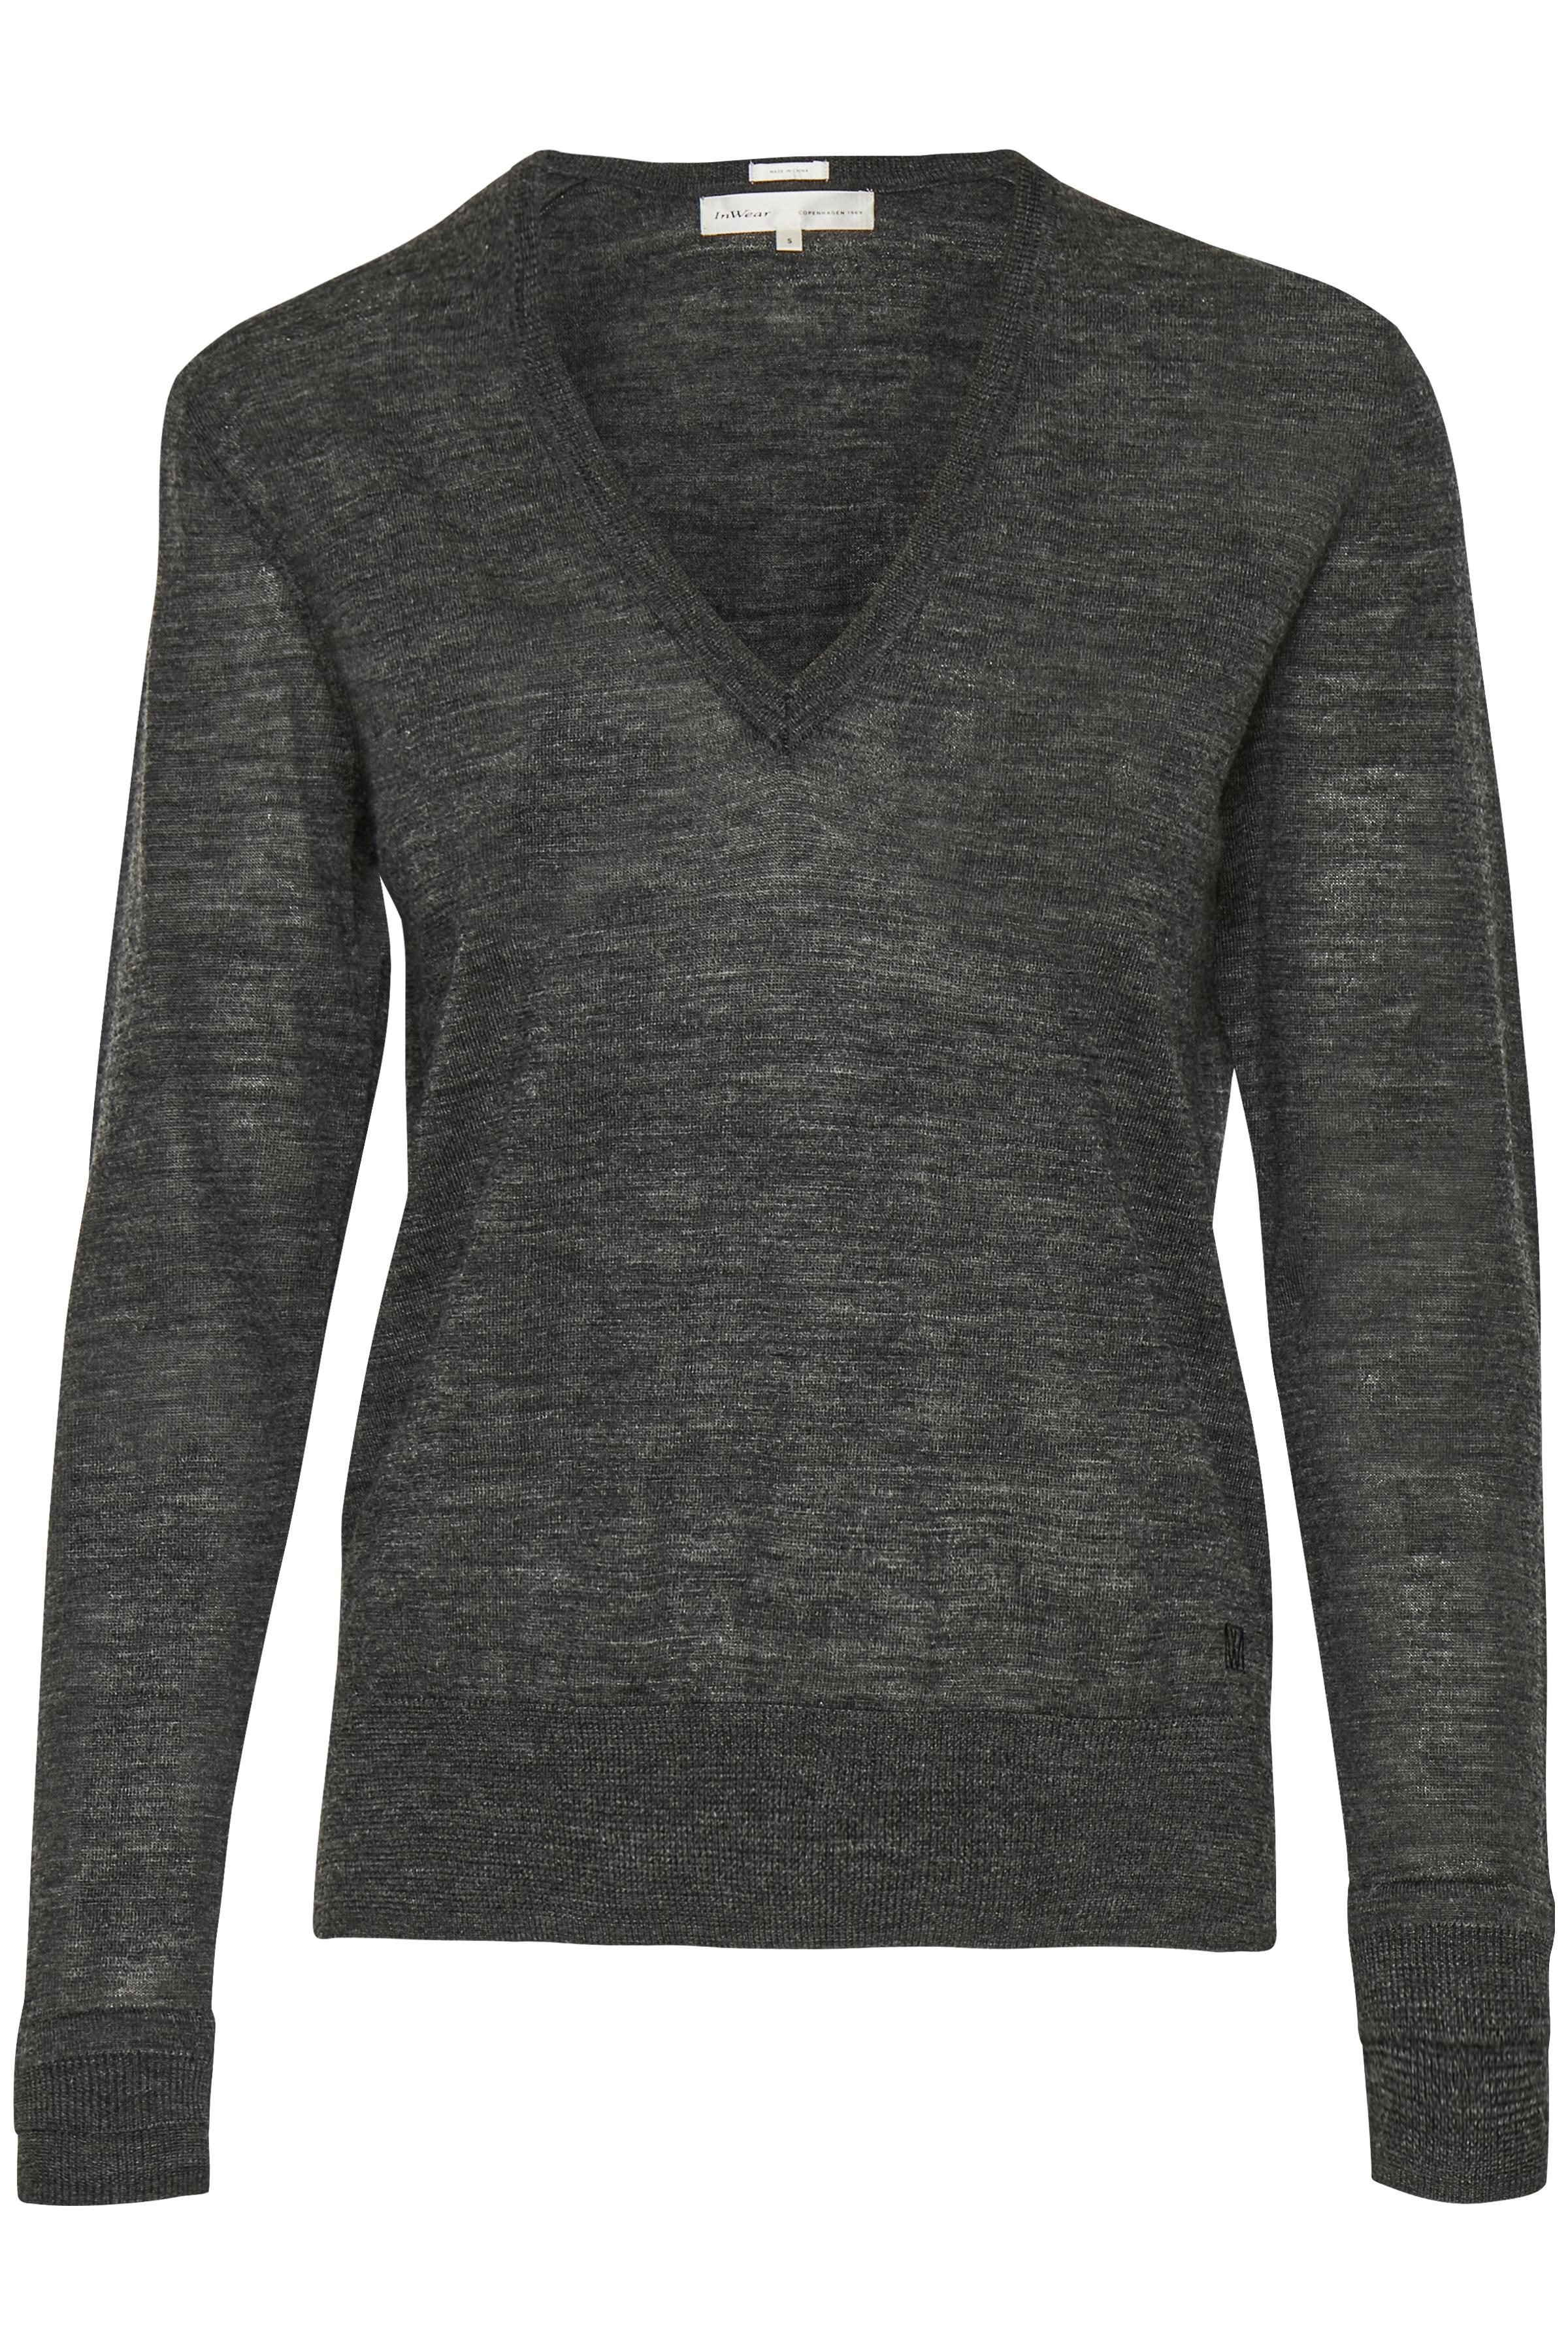 Dark Grey Melange Strikpullover – Køb Dark Grey Melange Strikpullover fra str. S-L her